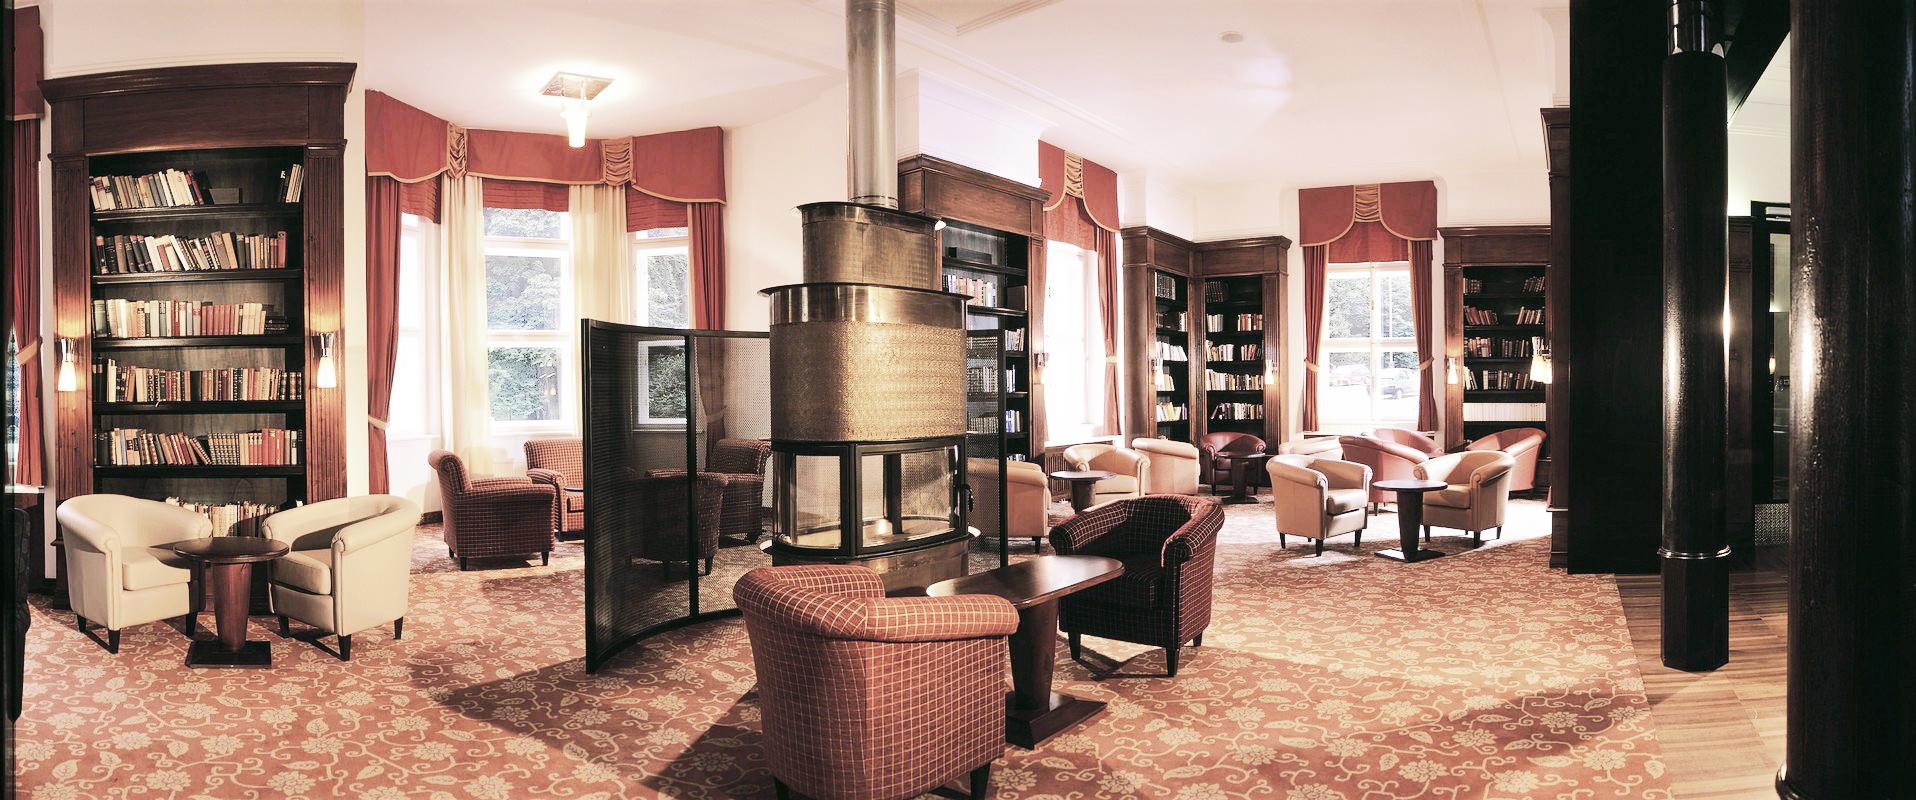 Hotel-Marienbad - Bibliothek